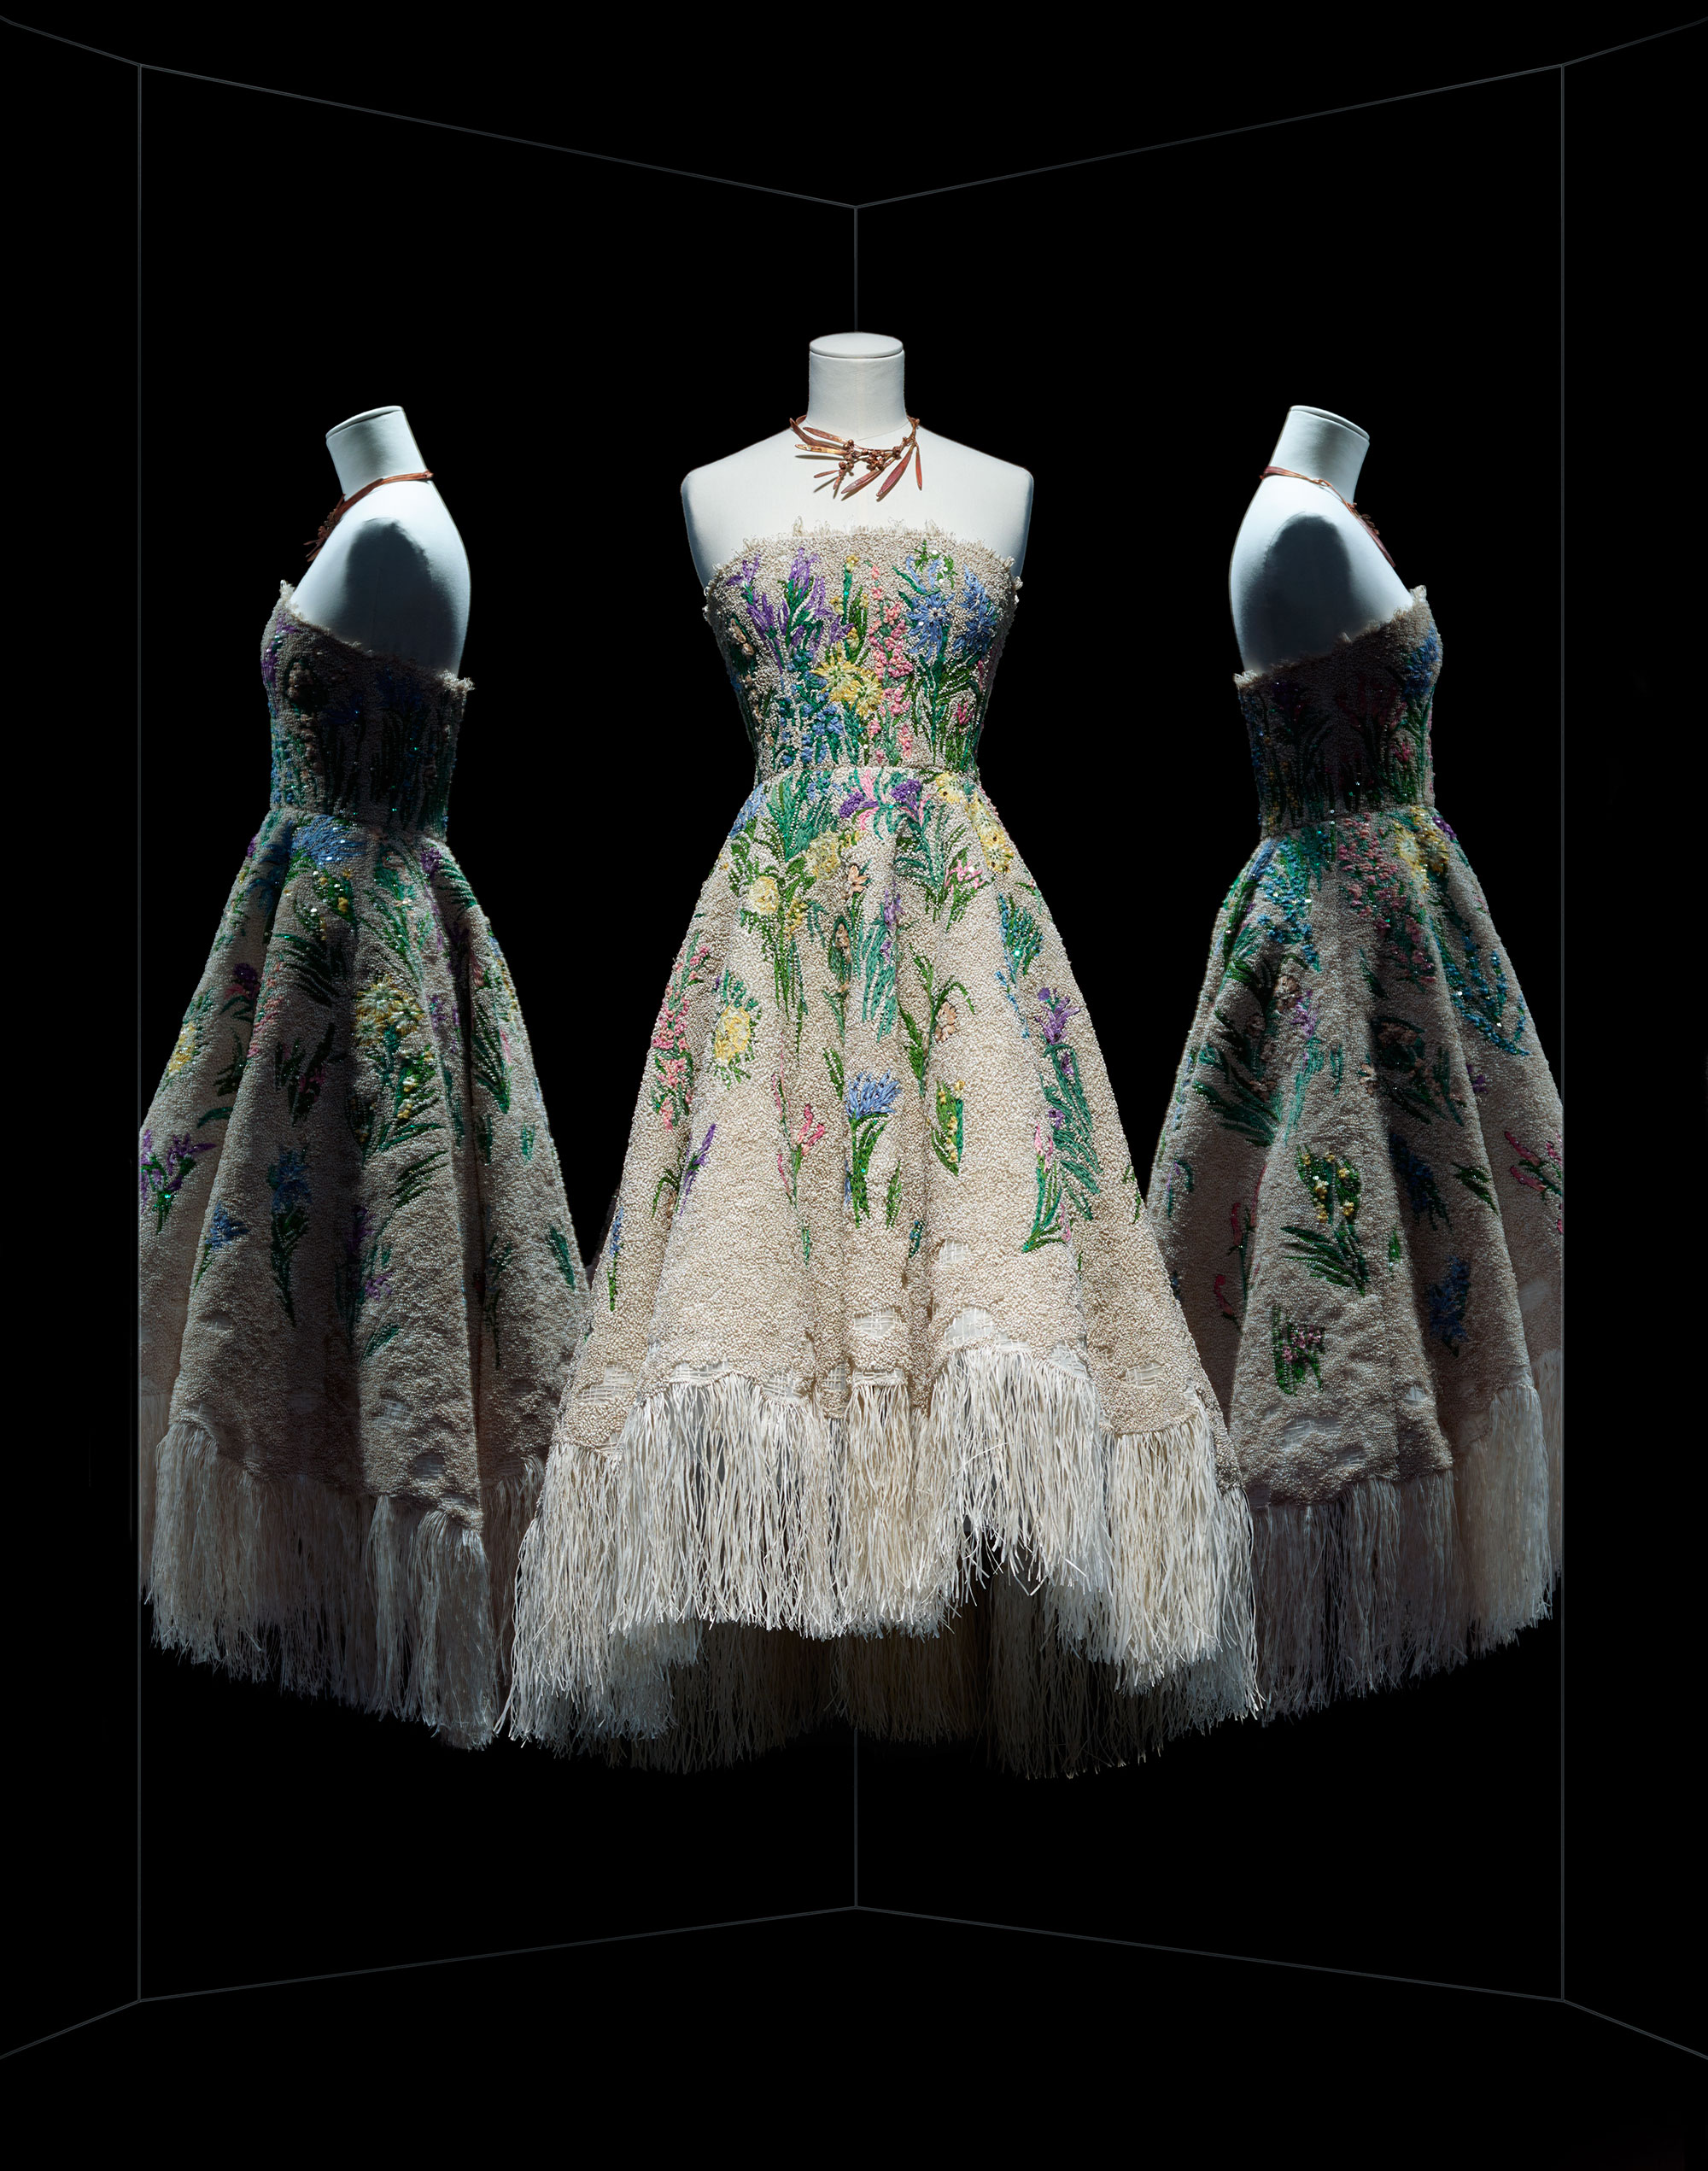 Maria Grazia Chiuri for Christian Dior, haute couture spring-summer 2017 / Photo:Photo:© Photo Les Arts Décoratifs / Nicholas Alan Cope